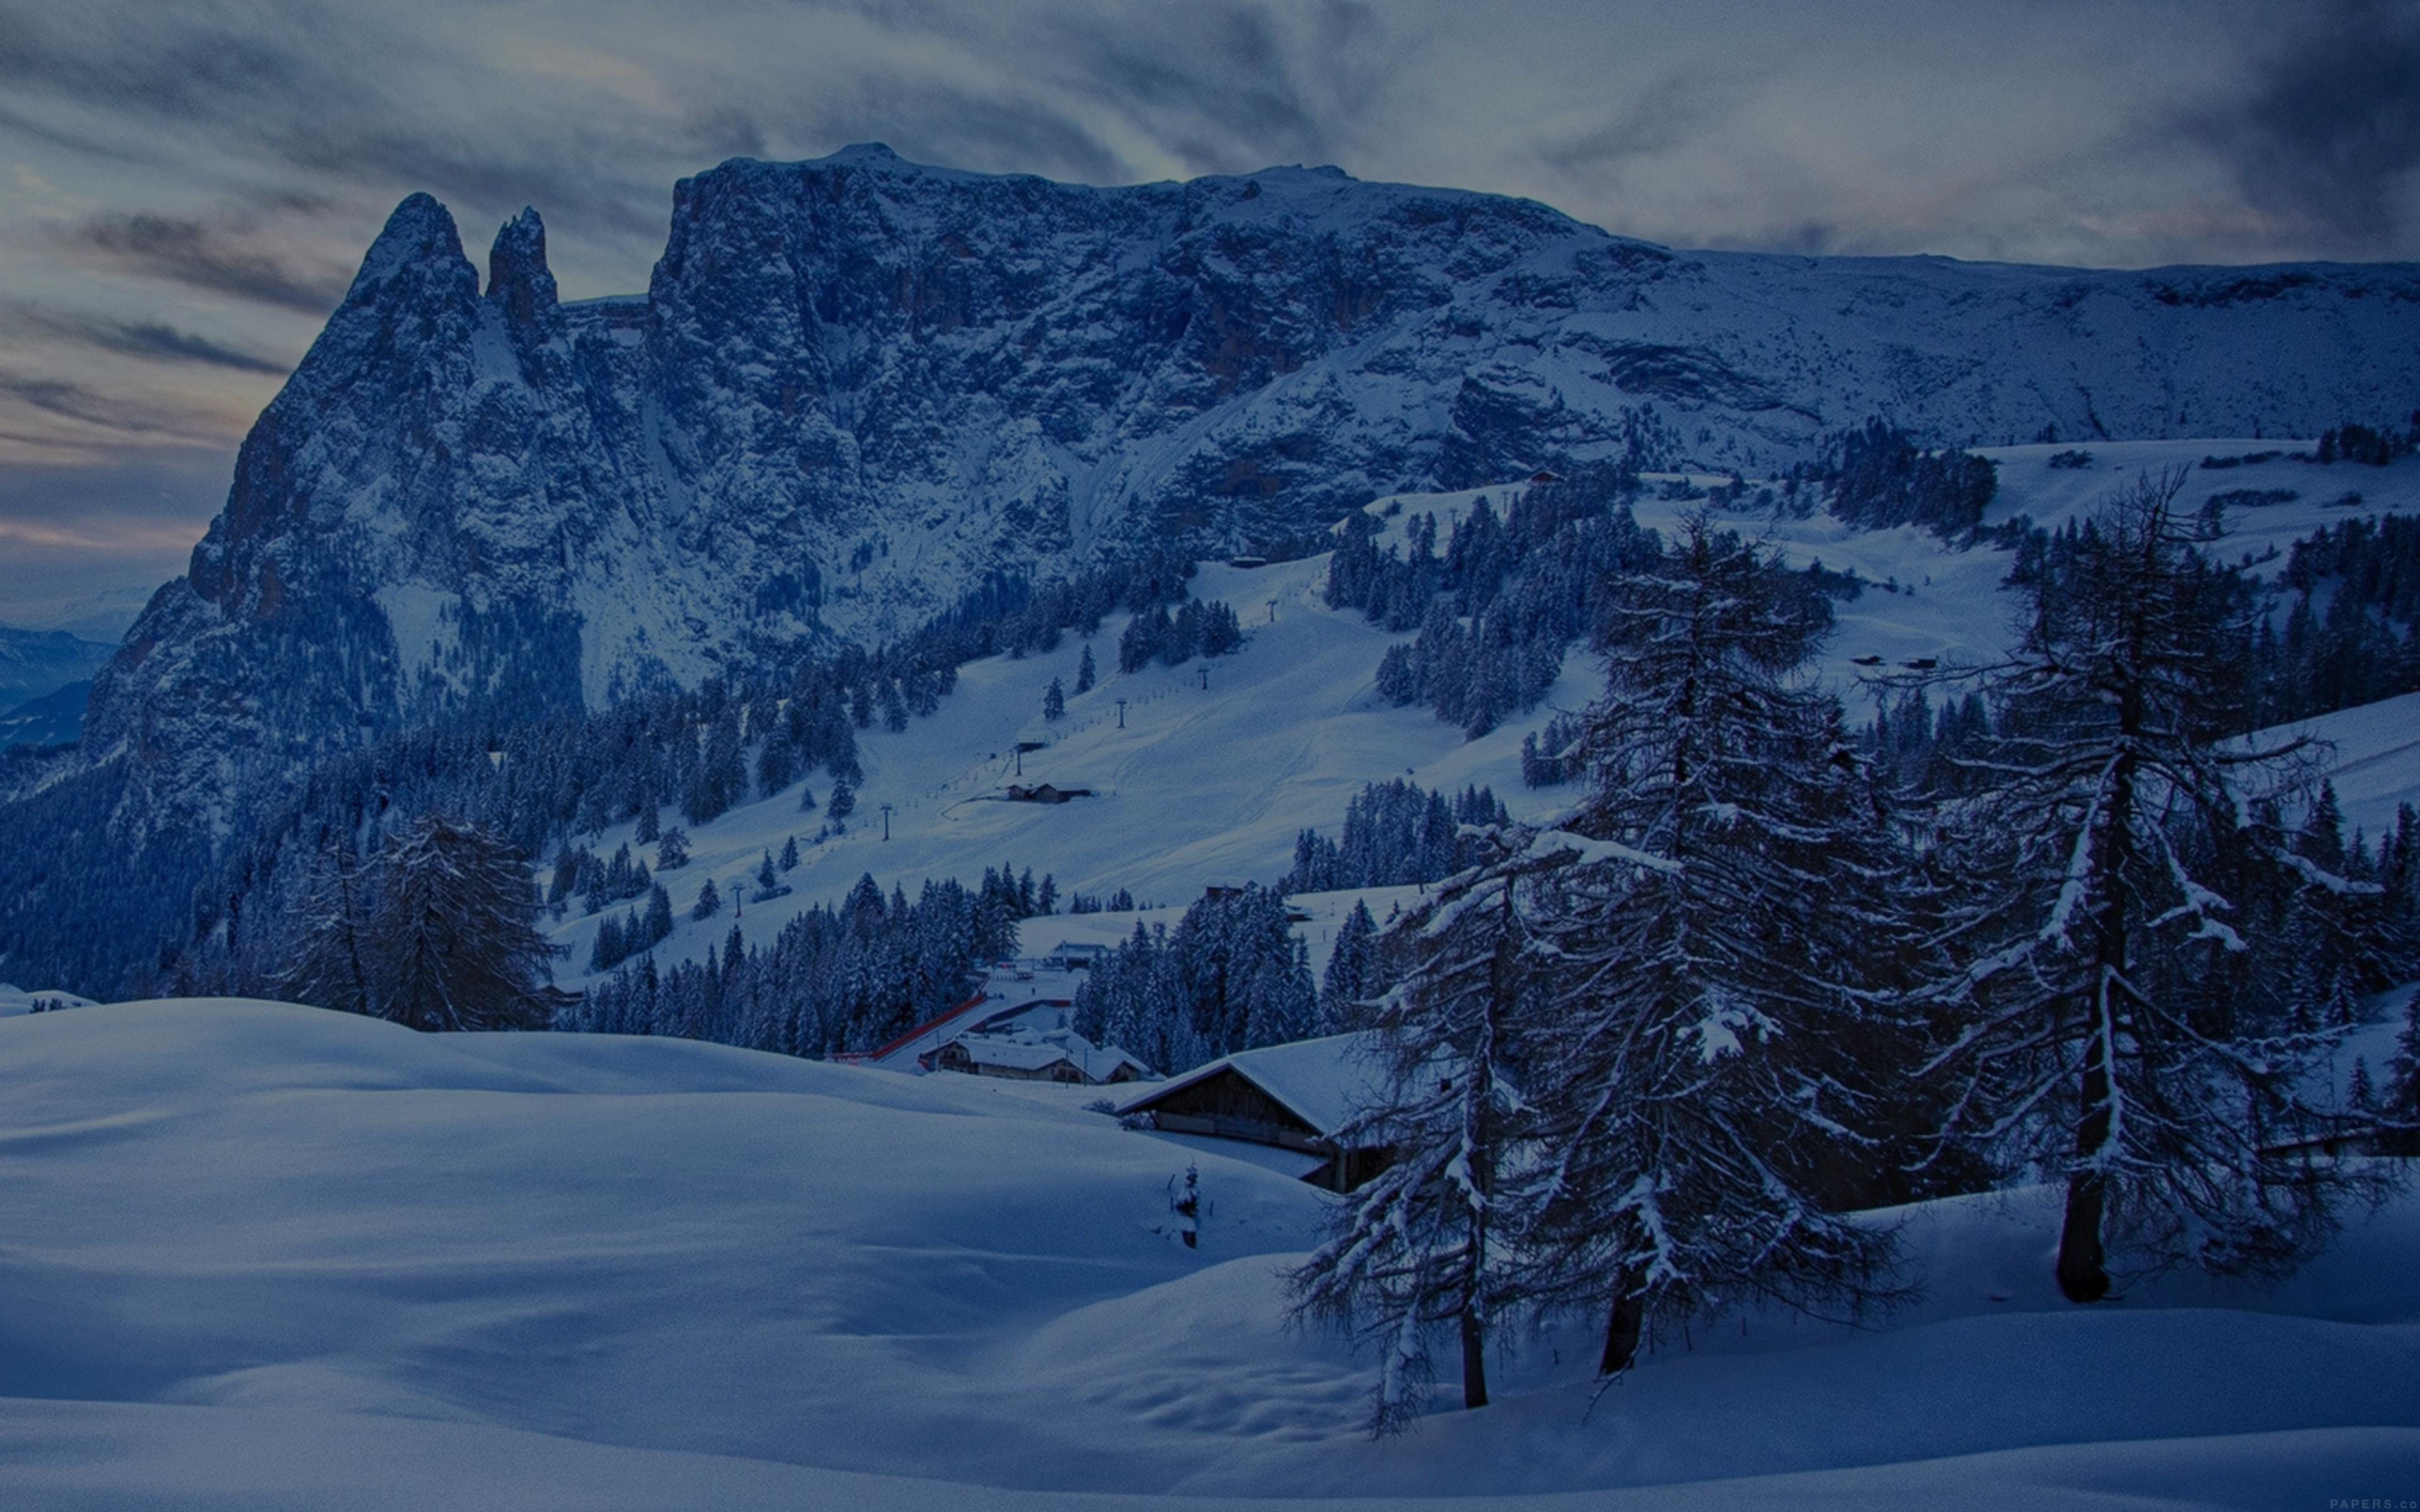 Wallpaper For Desktop Laptop Mr45 Mountain Blue Snow Winter Nature Ski Dark